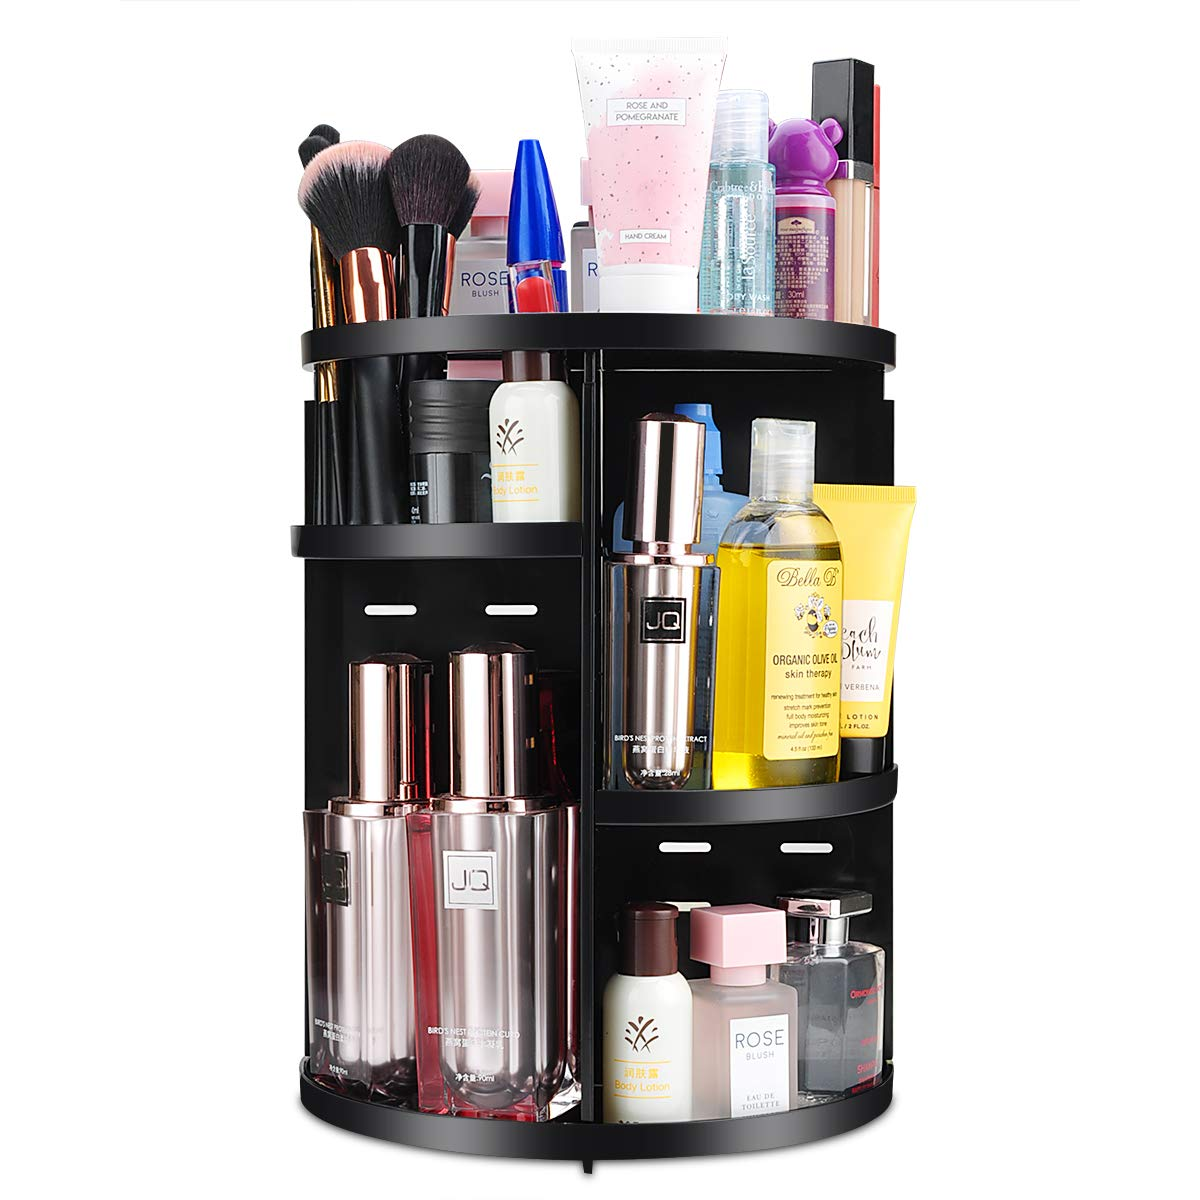 360 Spinning Makeup Organizer, Round Storage Rack Makeup Carousel Cosmetics Shelf Tower for Countertop and Bathroom, Black